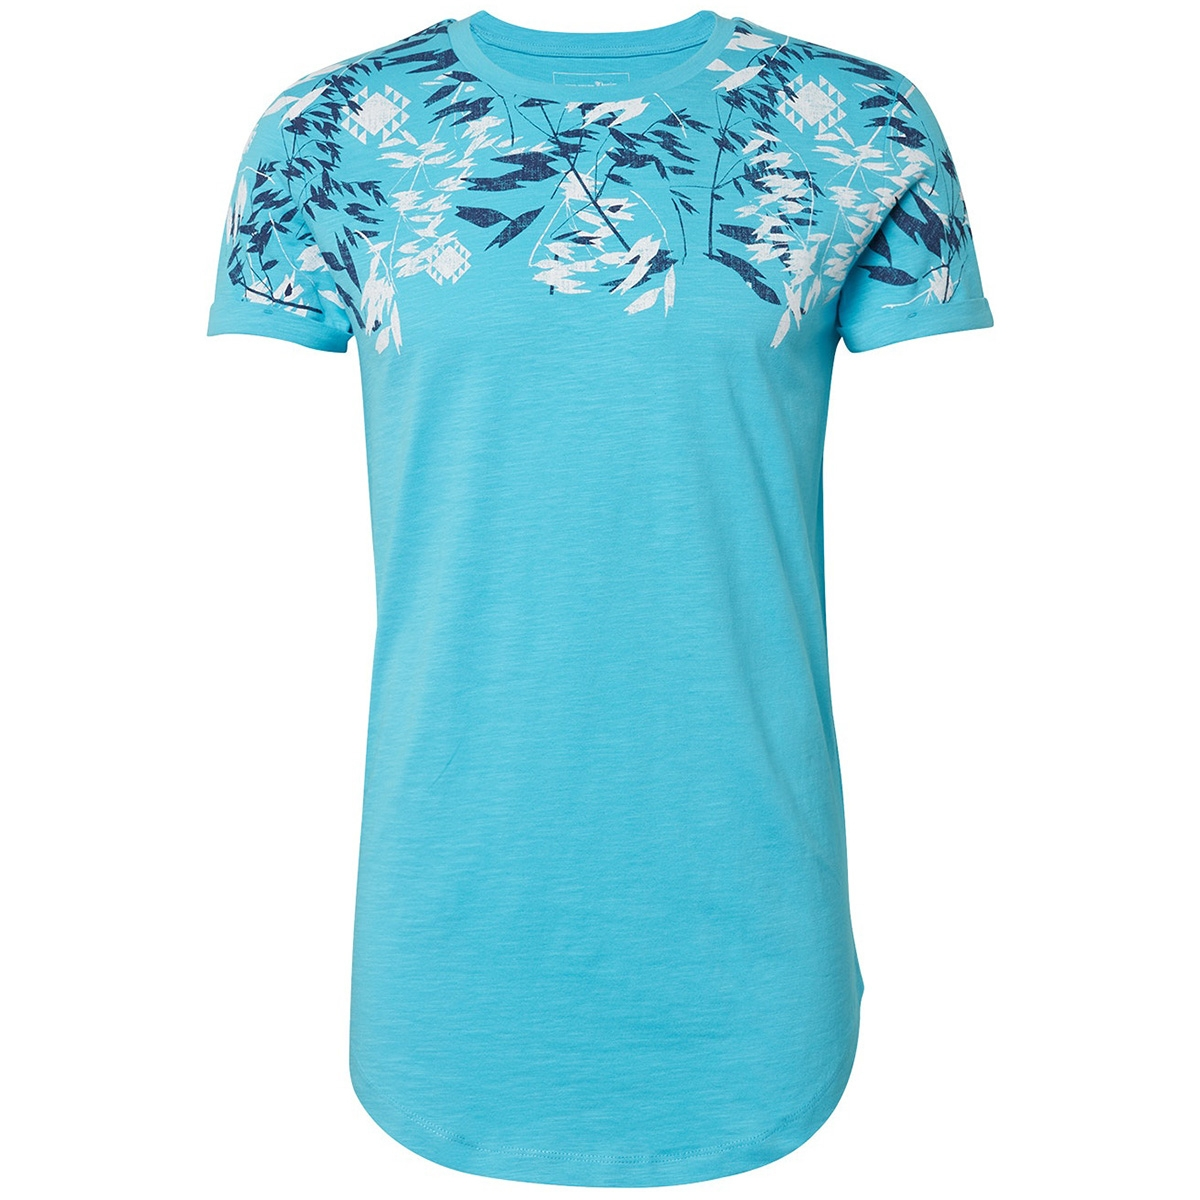 t shirt met motief 1010851xx12 tom tailor t-shirt 16913